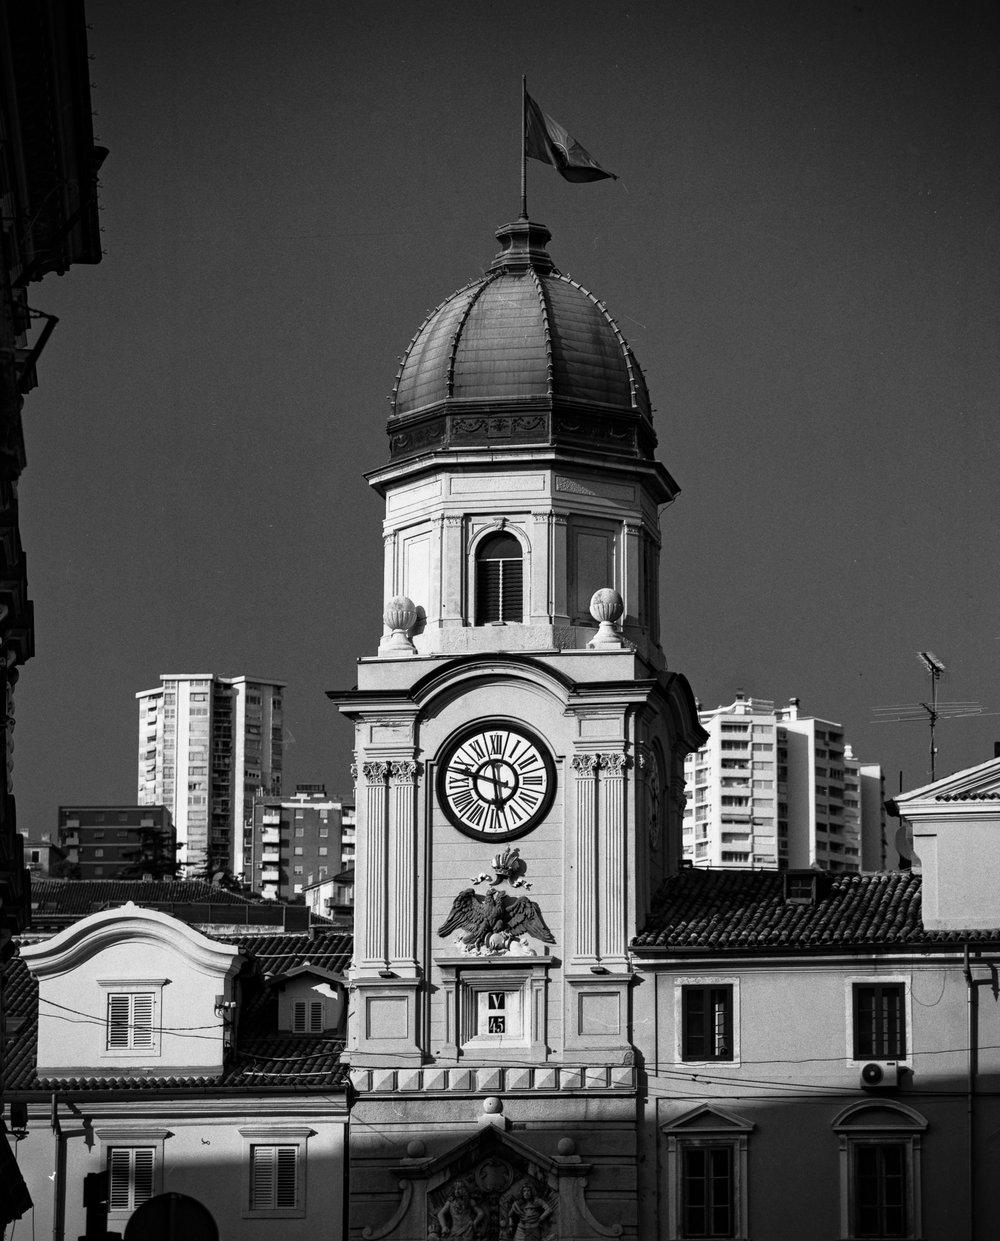 Rijeka Tower